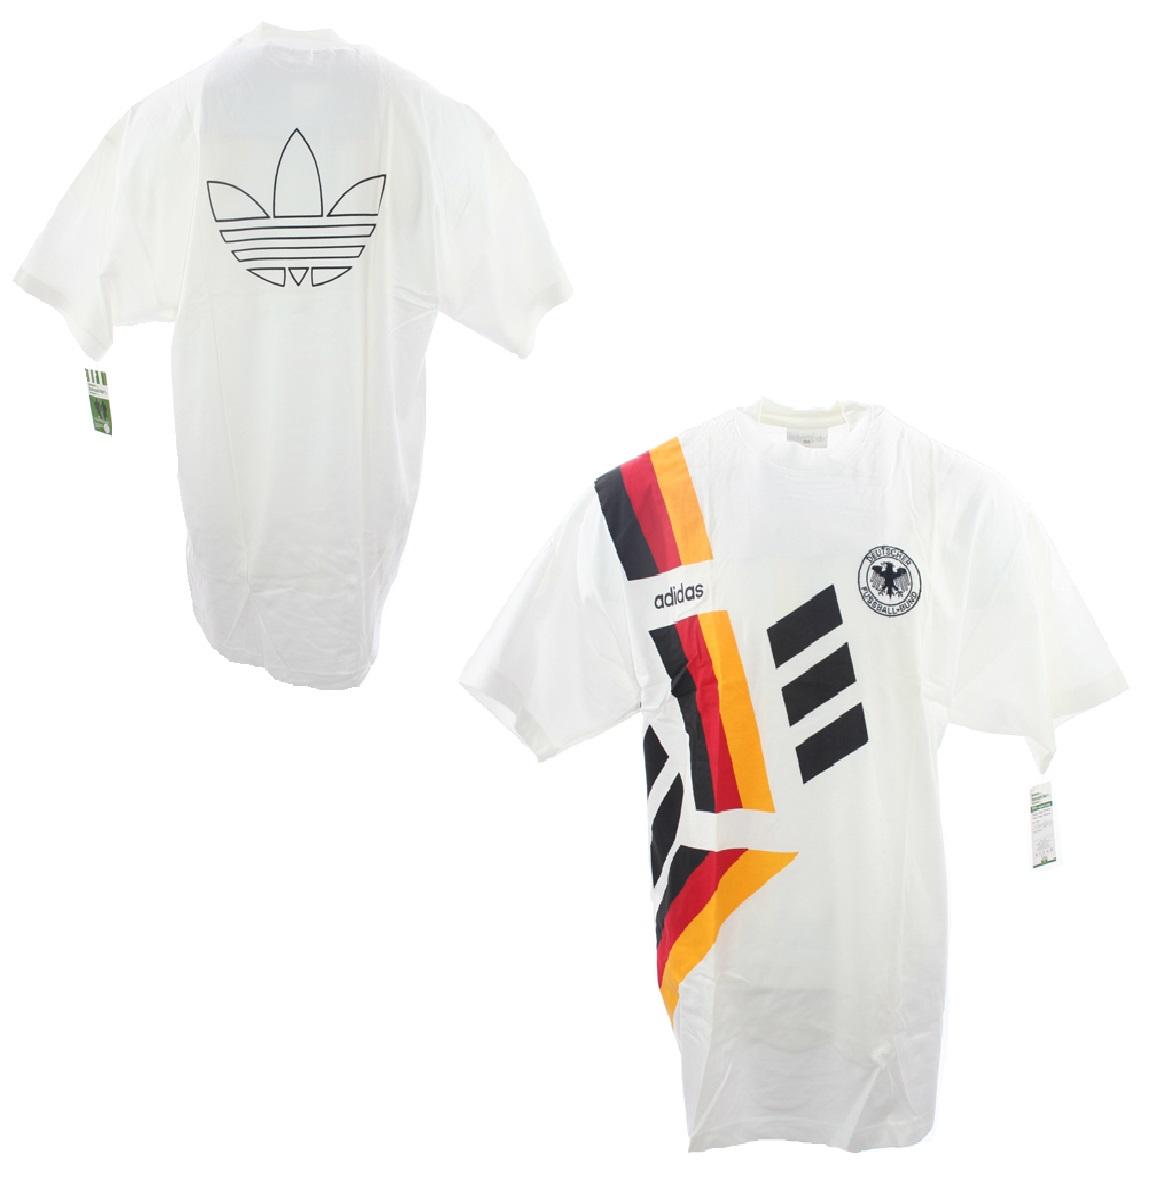 adidas deutschland t shirt 1994 dfb 94 trikot retro herren. Black Bedroom Furniture Sets. Home Design Ideas